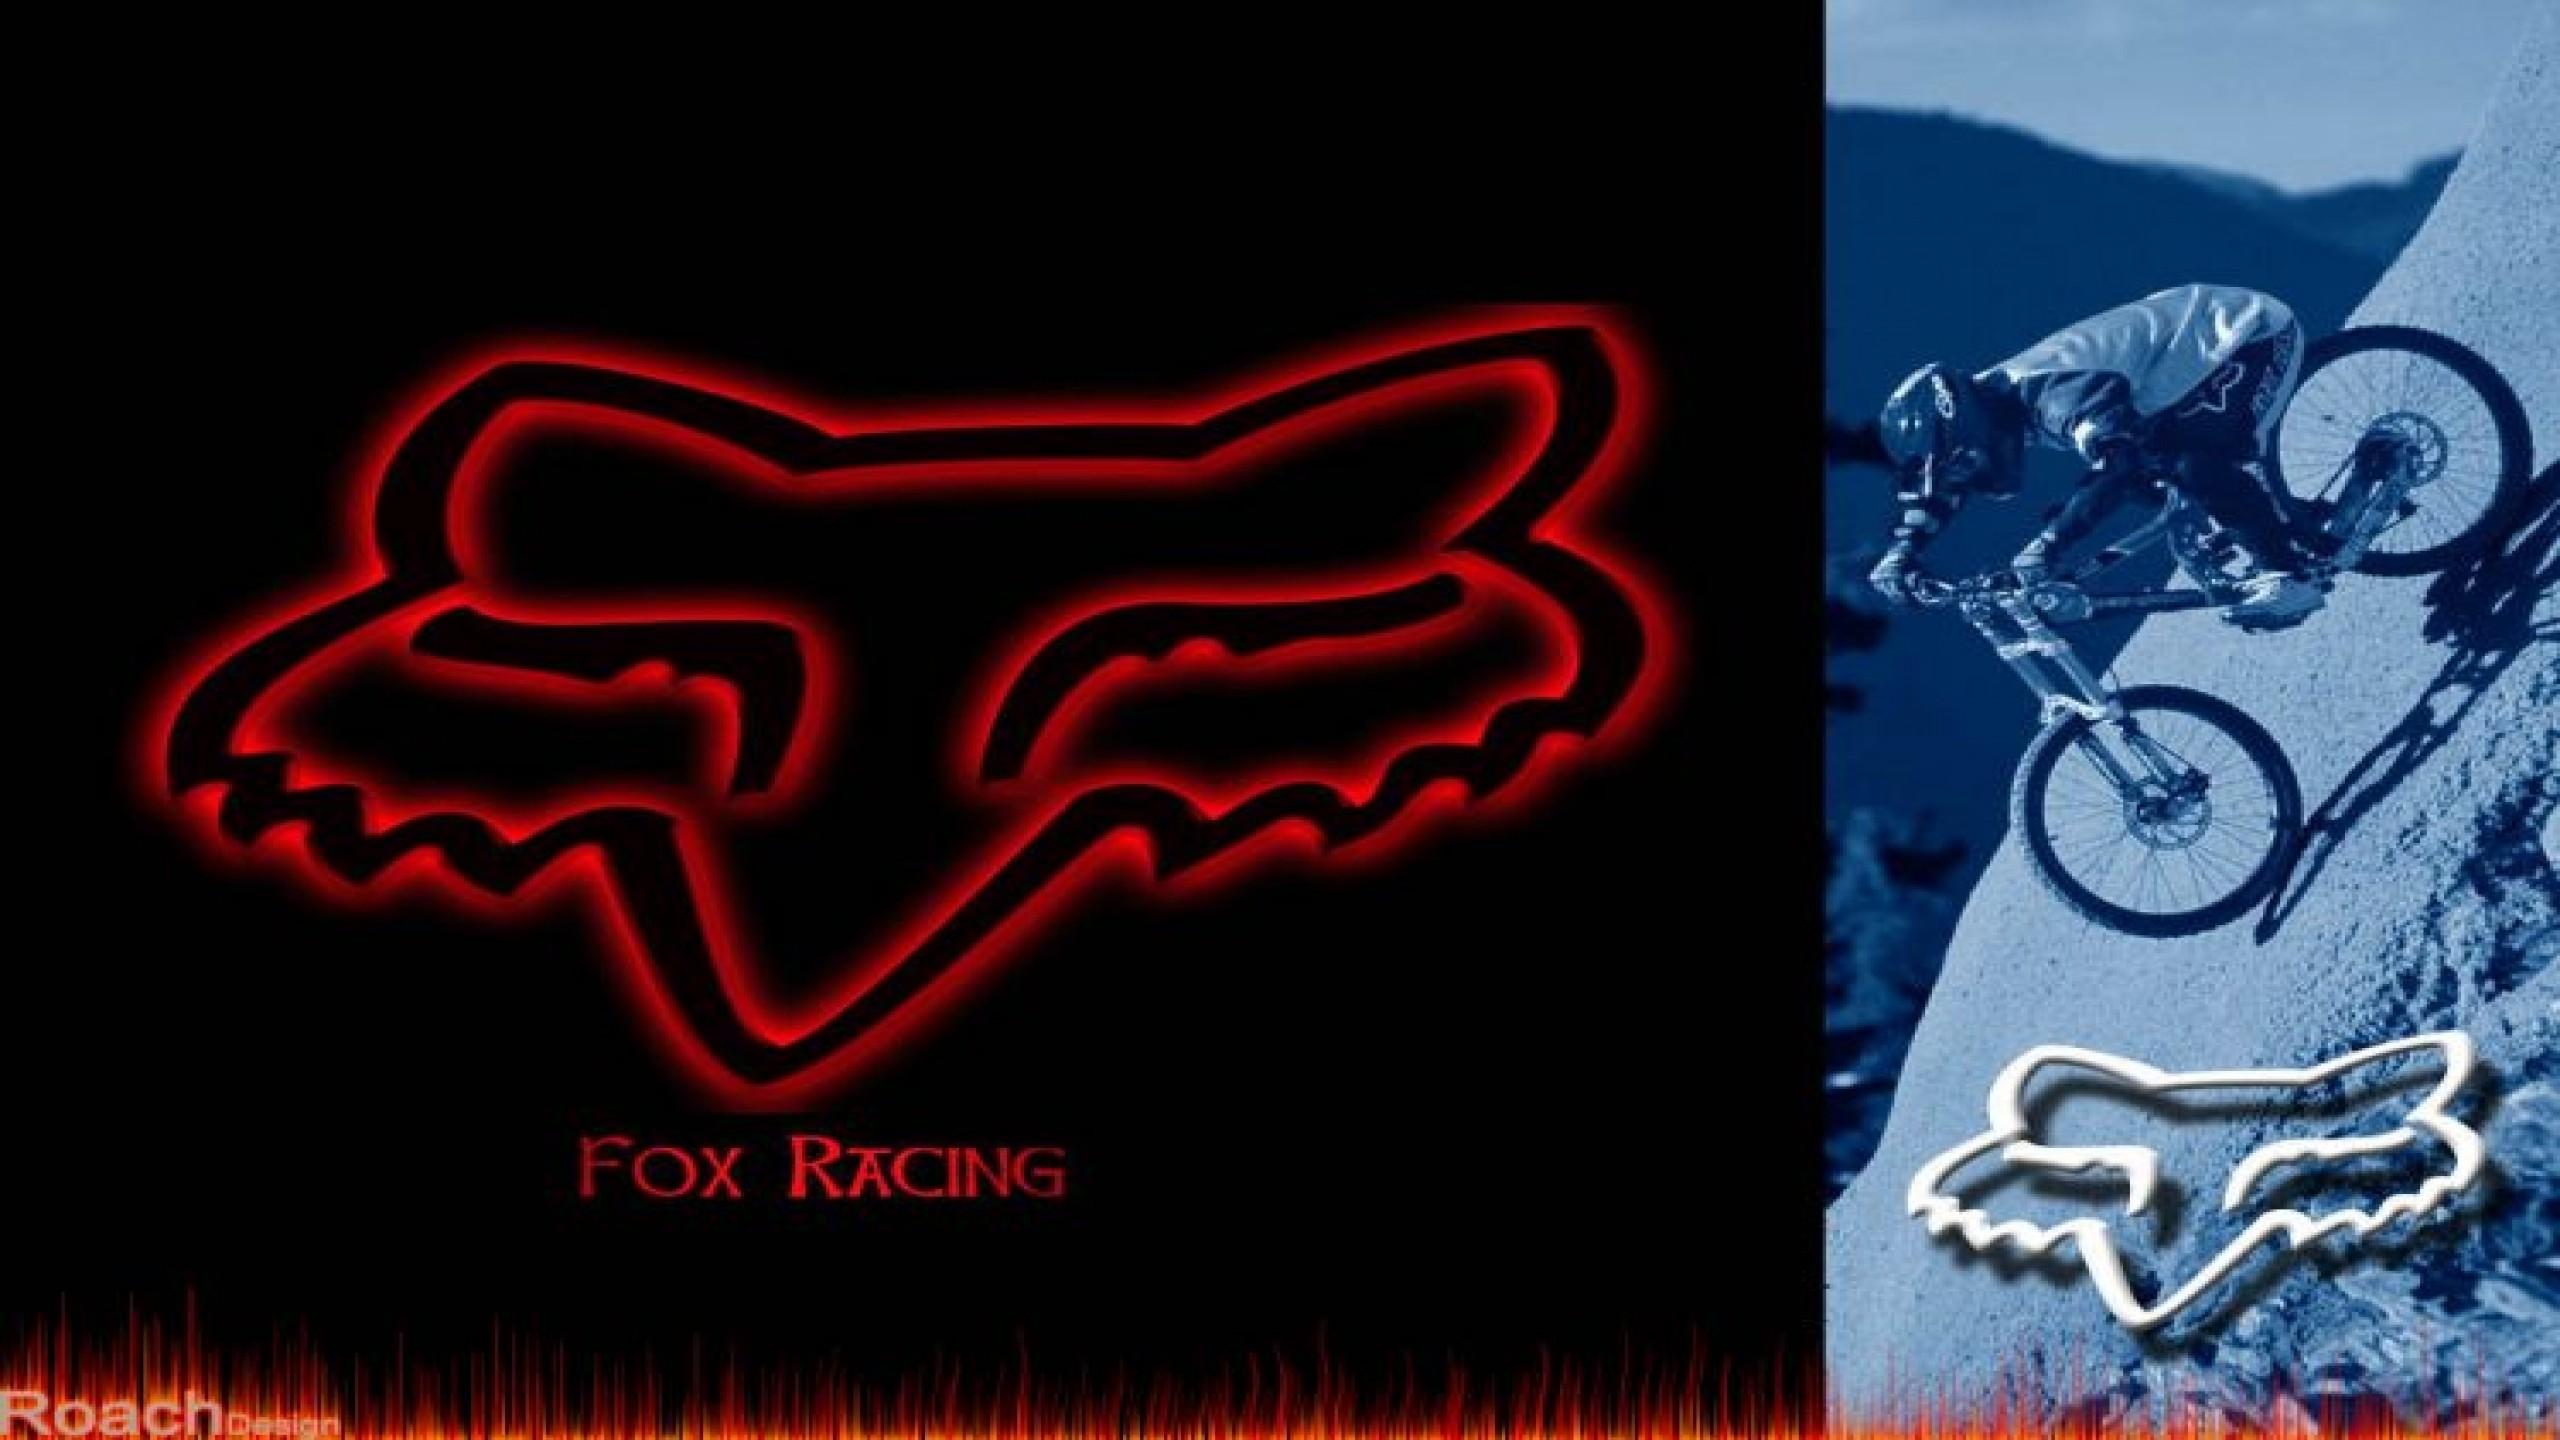 Free Image Fox Racing Amazing Free Download Wallpapers Hi Res